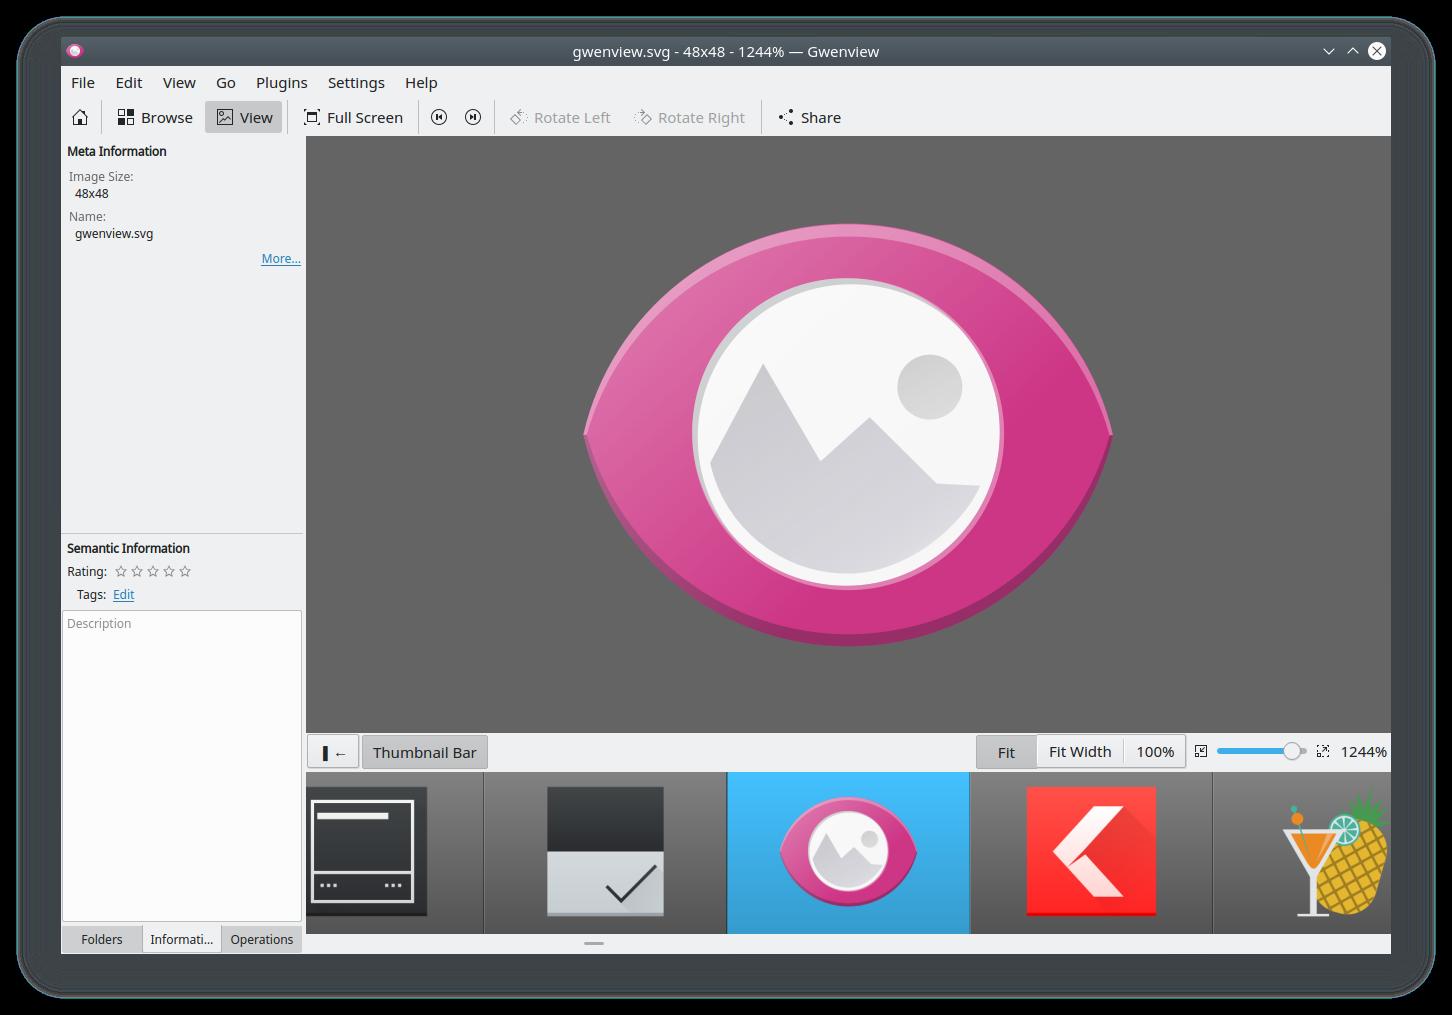 KDE Applications 18.04